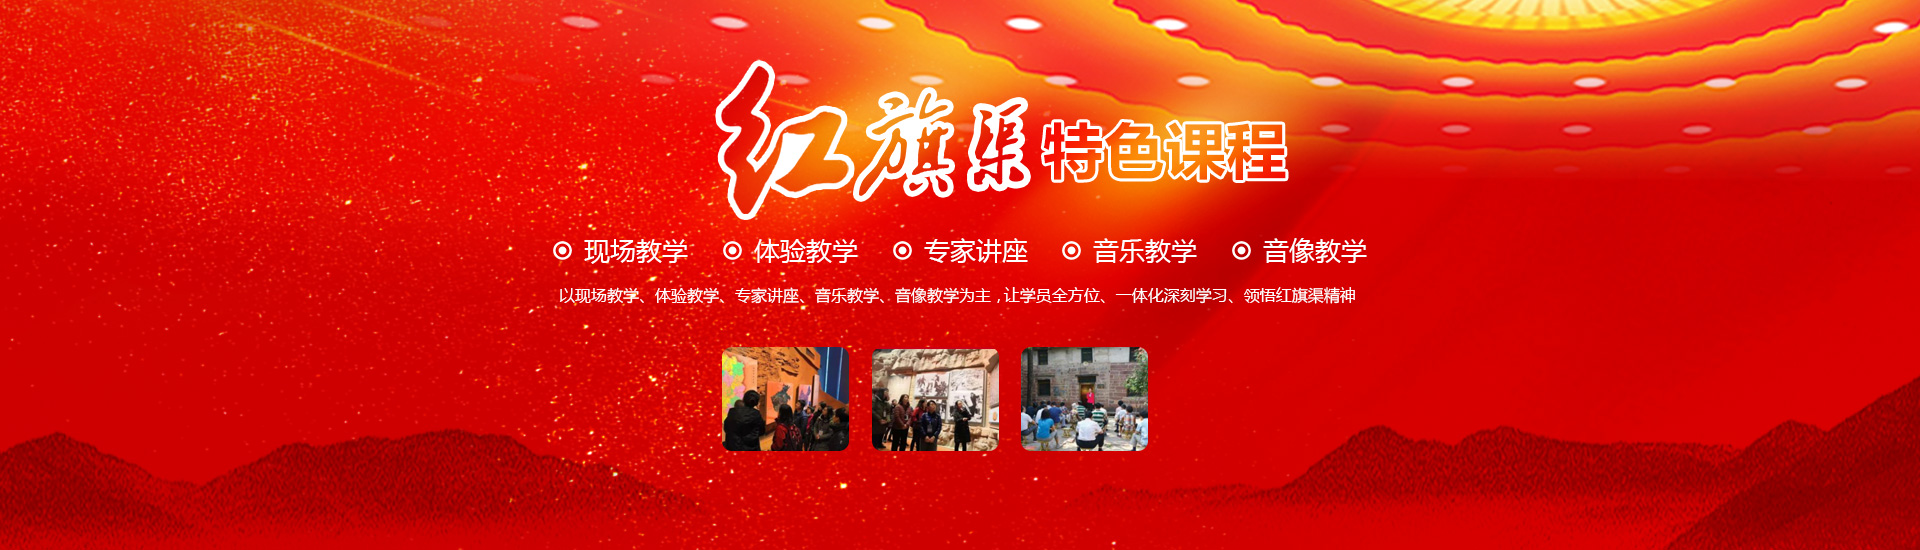 long8龙8国际首页_老虎机网站龙8的网址_龙8国际备用网站